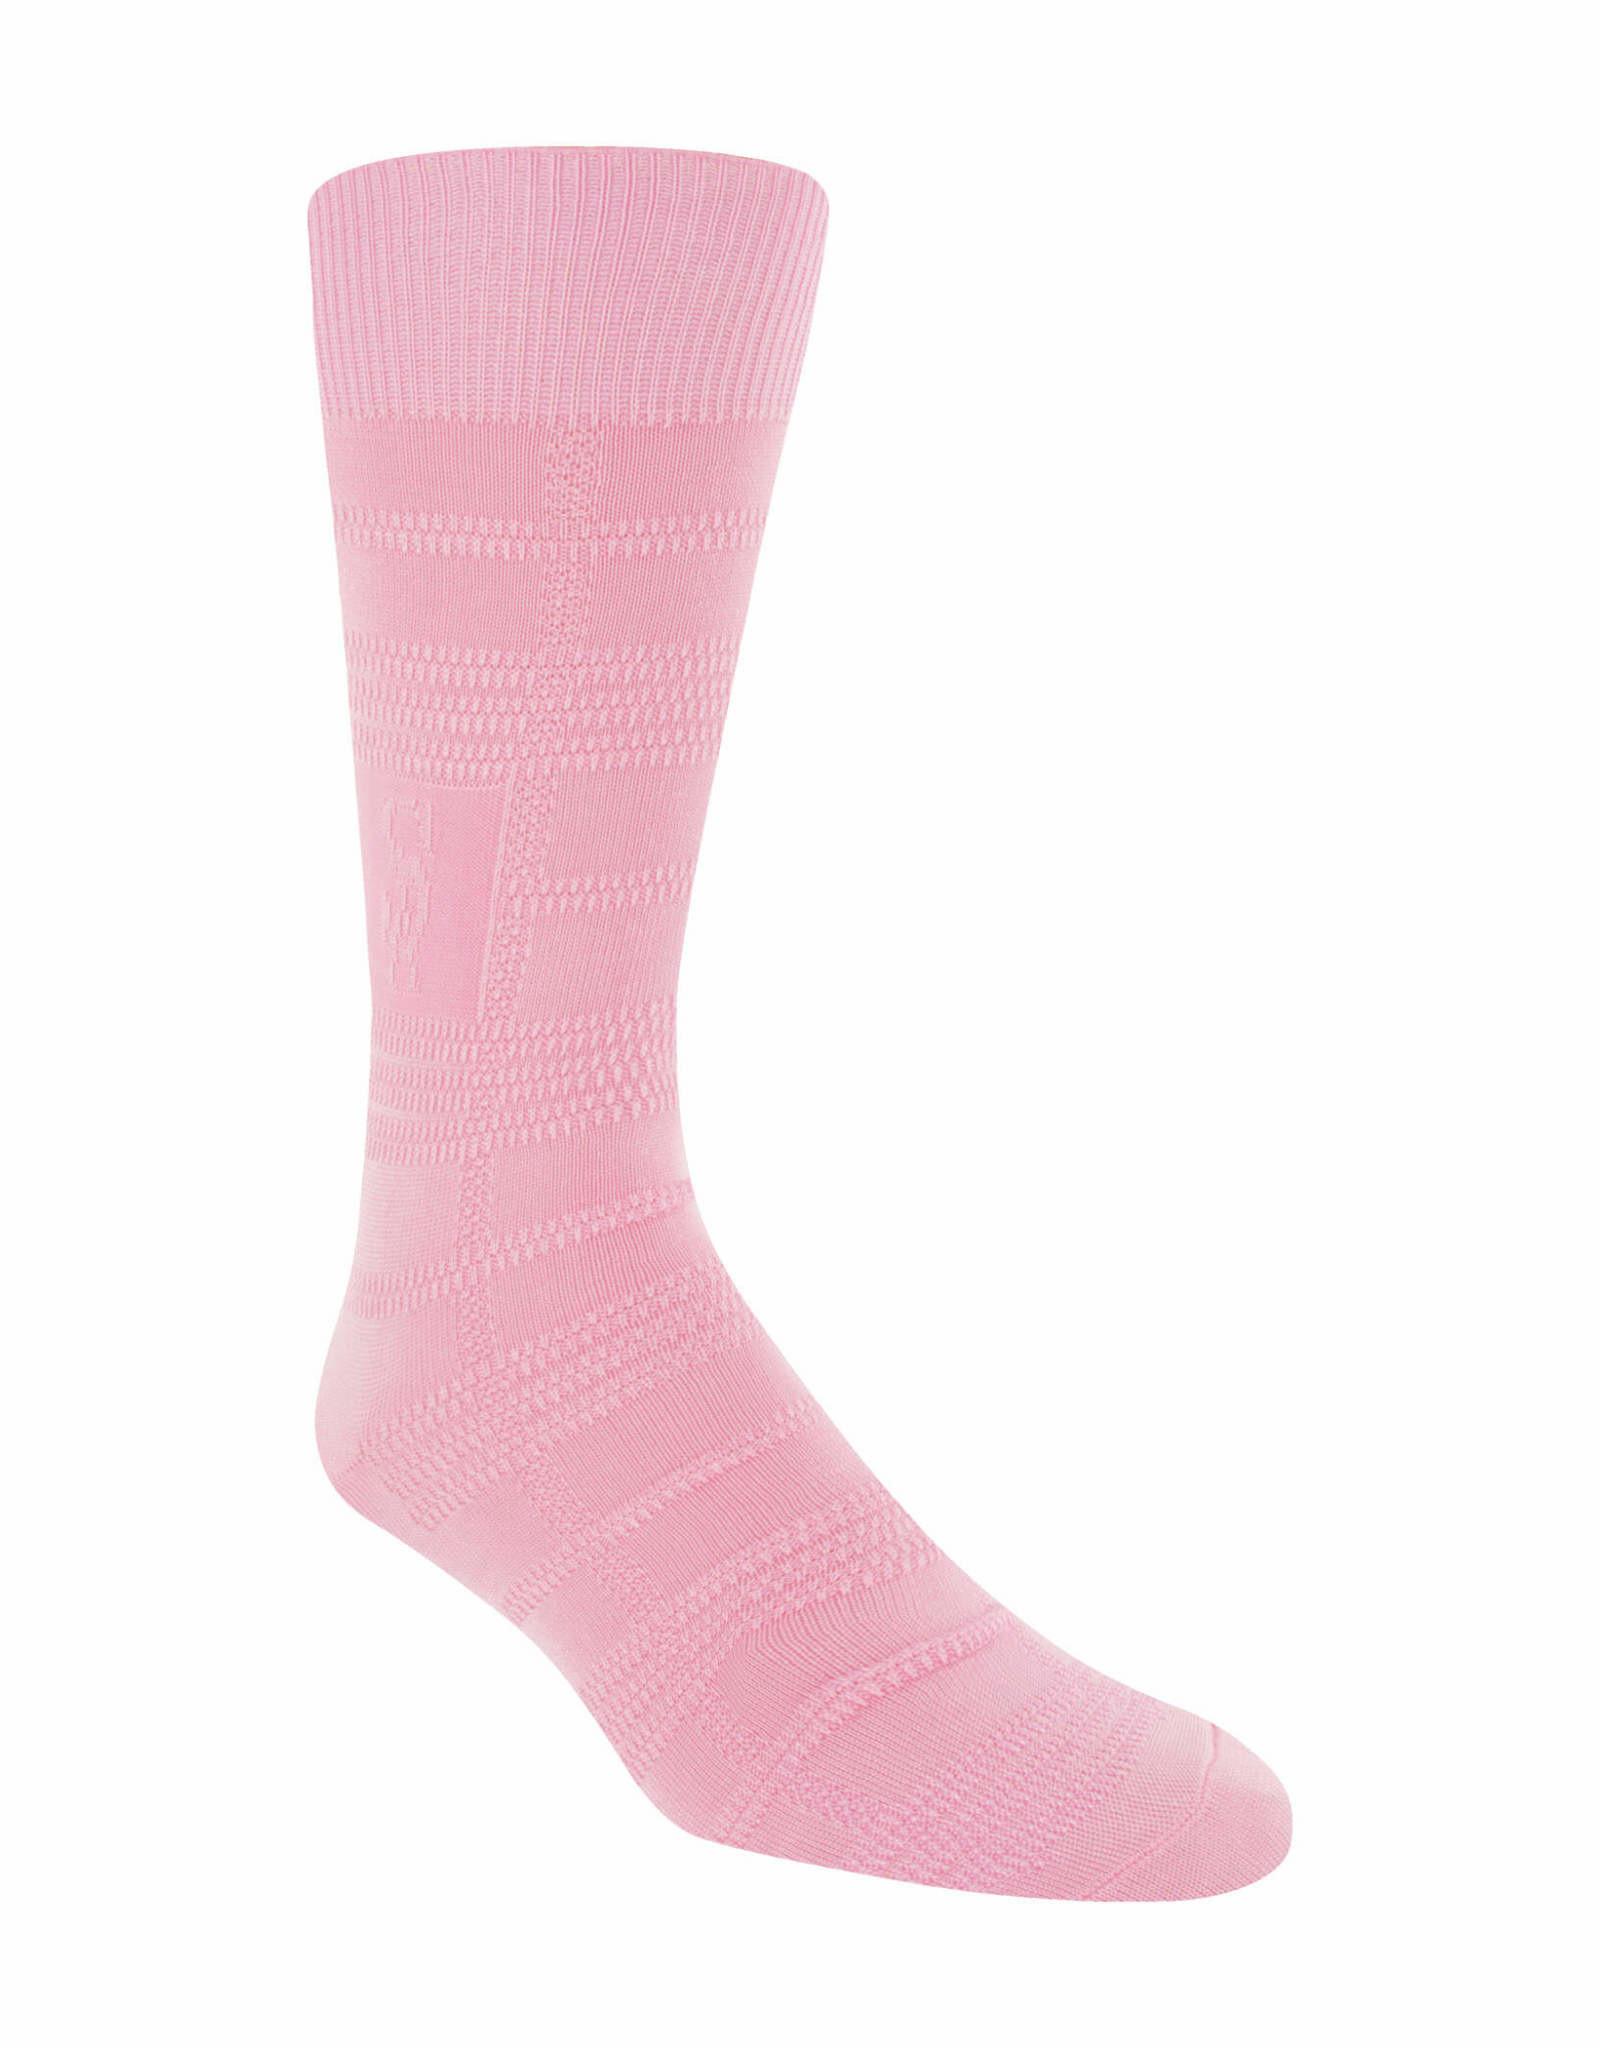 Stacy Adams Socks Stacy Adams Gemstone For Size 8-12.5 Pink